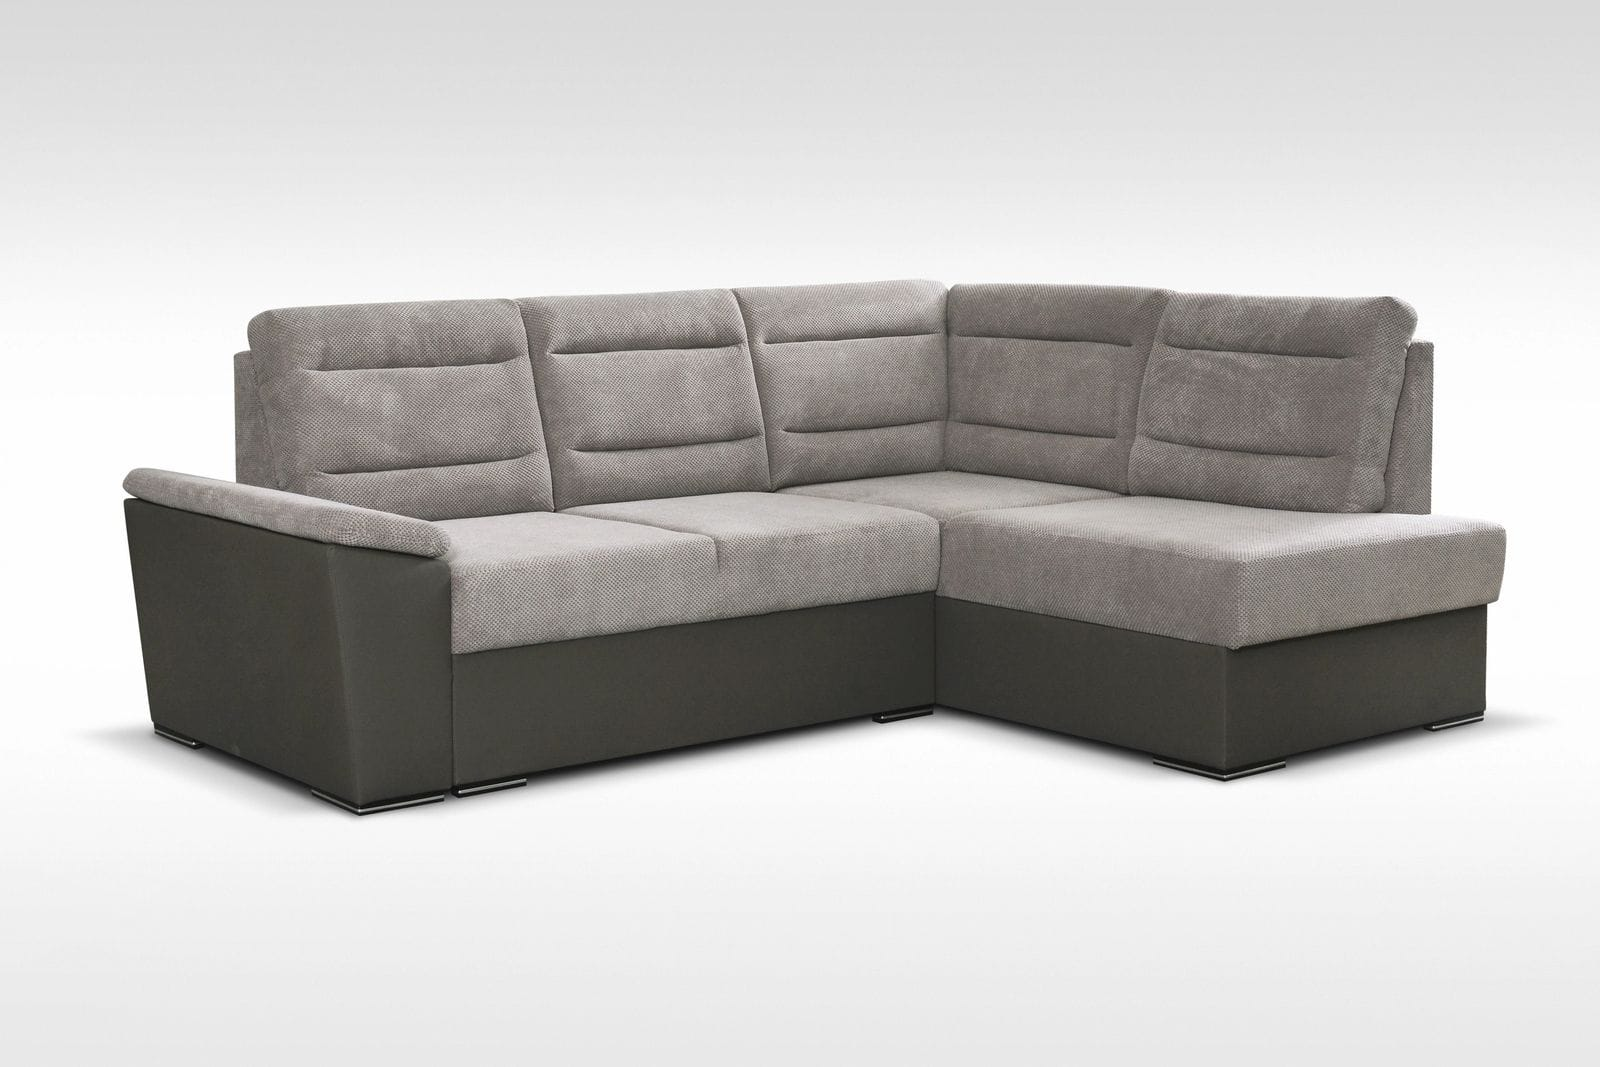 Minos Gray Sectional Sofa by Skyler Designs